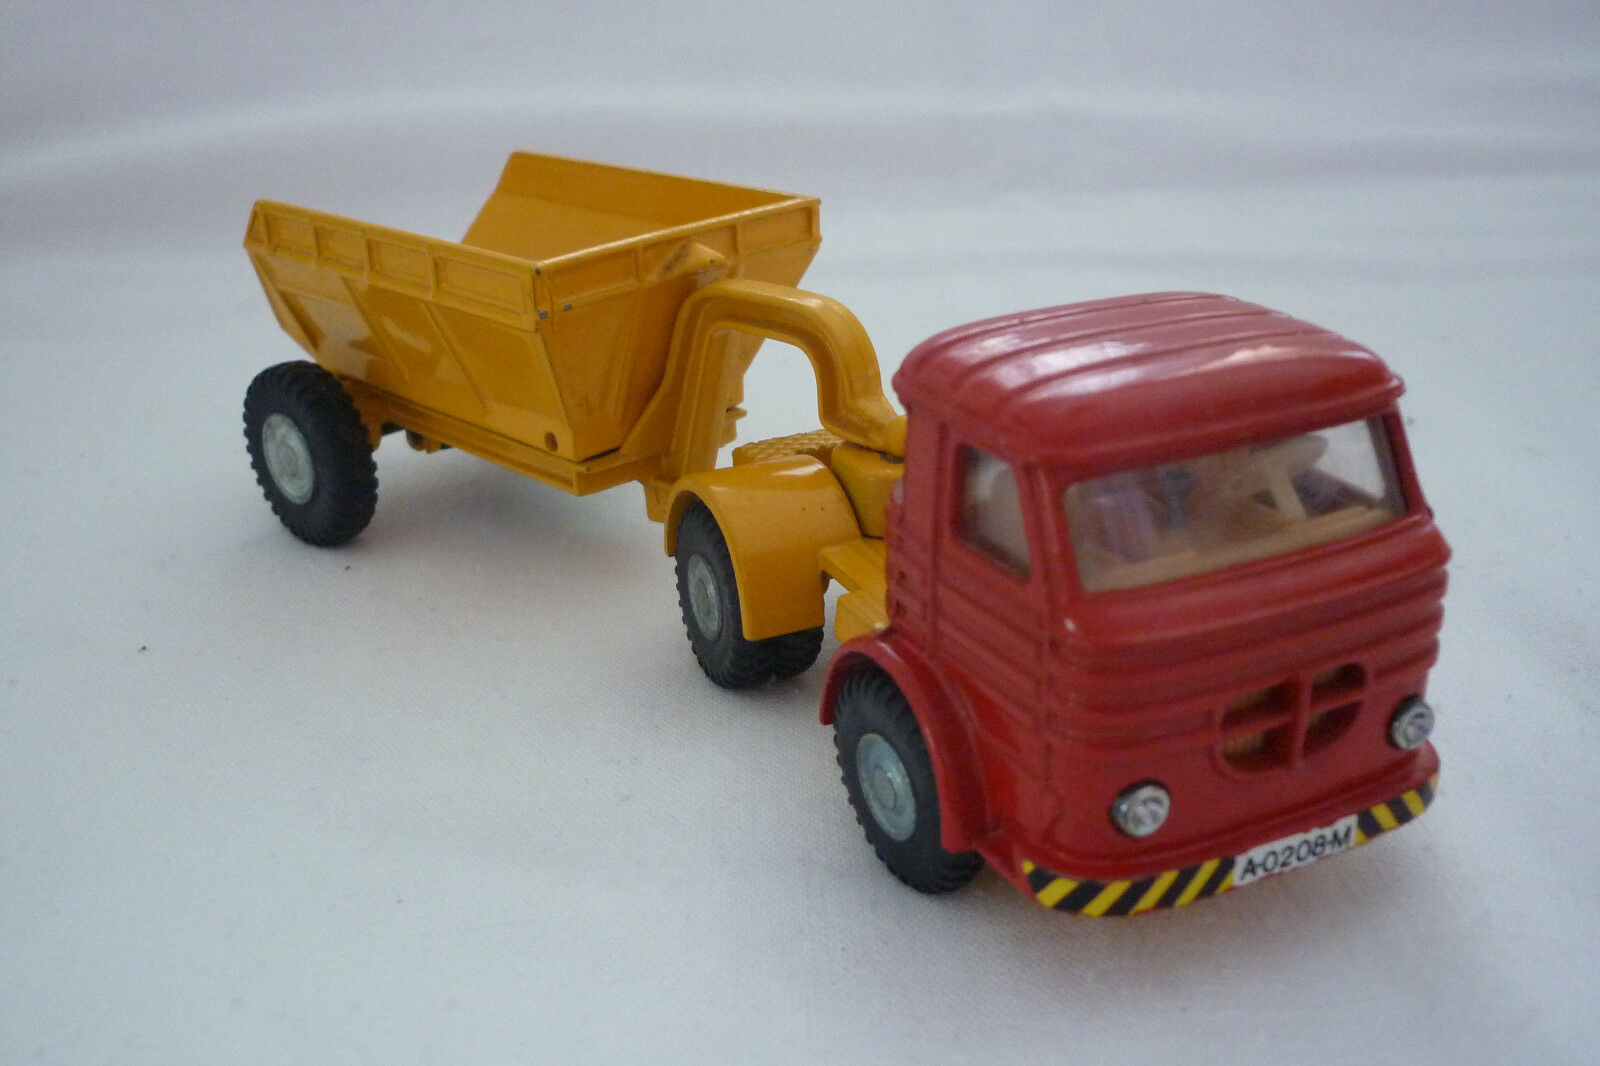 Joal - - - Vintage Miniatura De Metal - Camión con muldenkipperanhänger - ( Unb 19) 582014